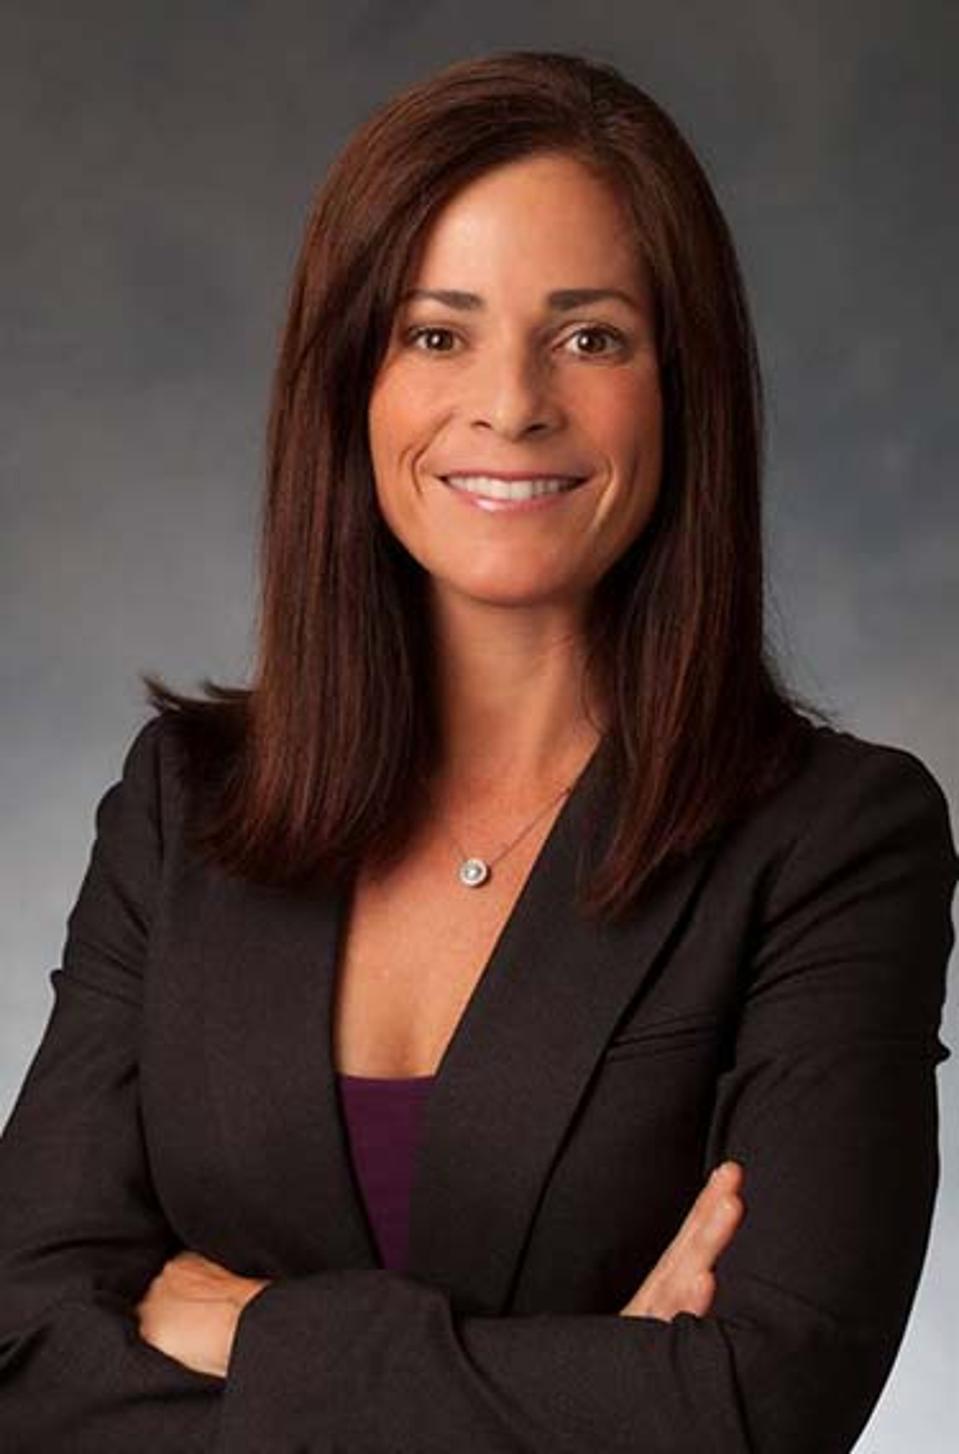 Shannon Eusey, Partner, CEO, Beacon Pointe Advisors